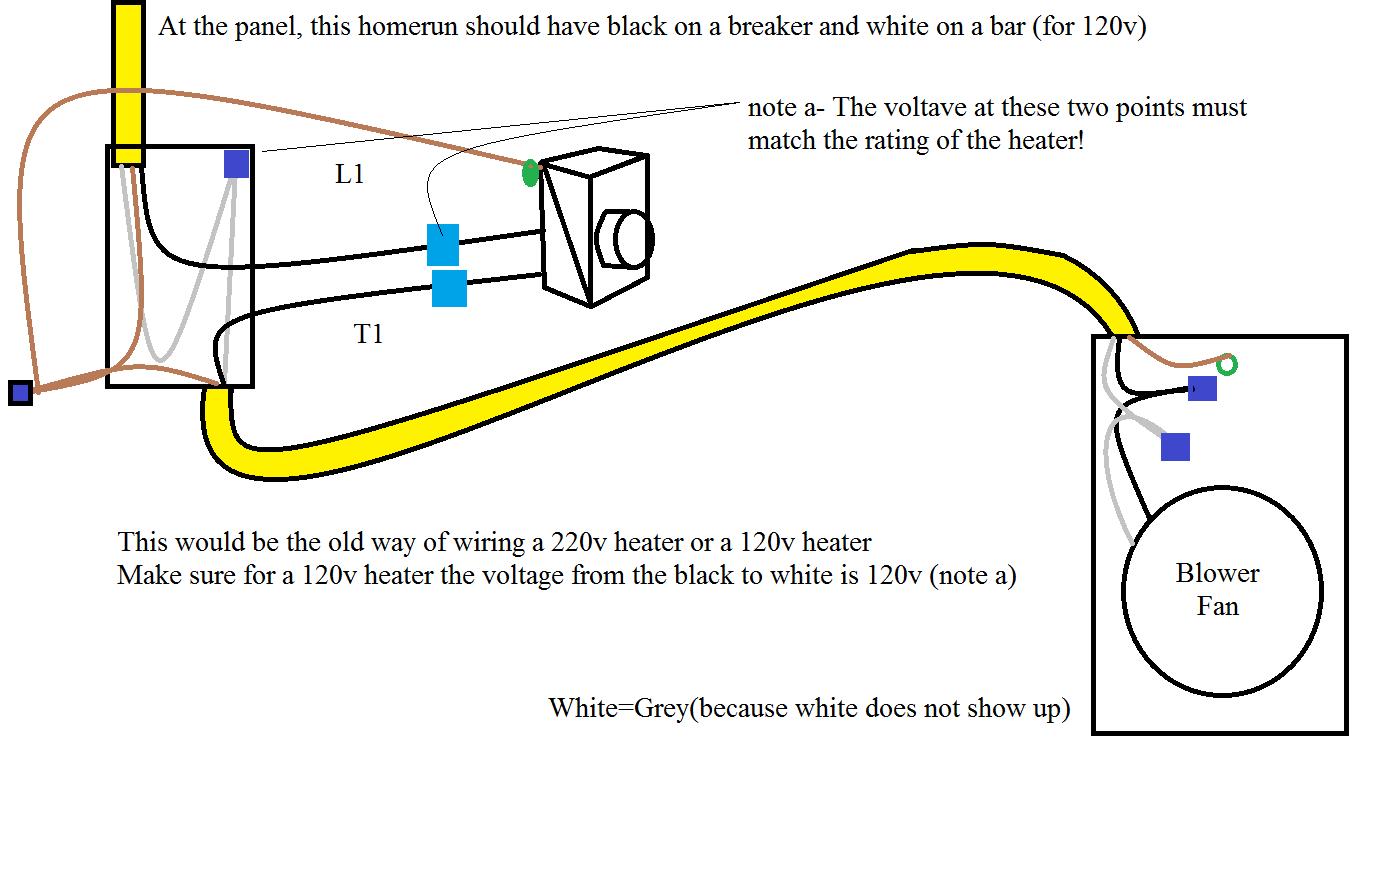 Tremendous Wiring For 220 Heater Wiring Diagram Database Wiring Cloud Ittabpendurdonanfuldomelitekicepsianuembamohammedshrineorg